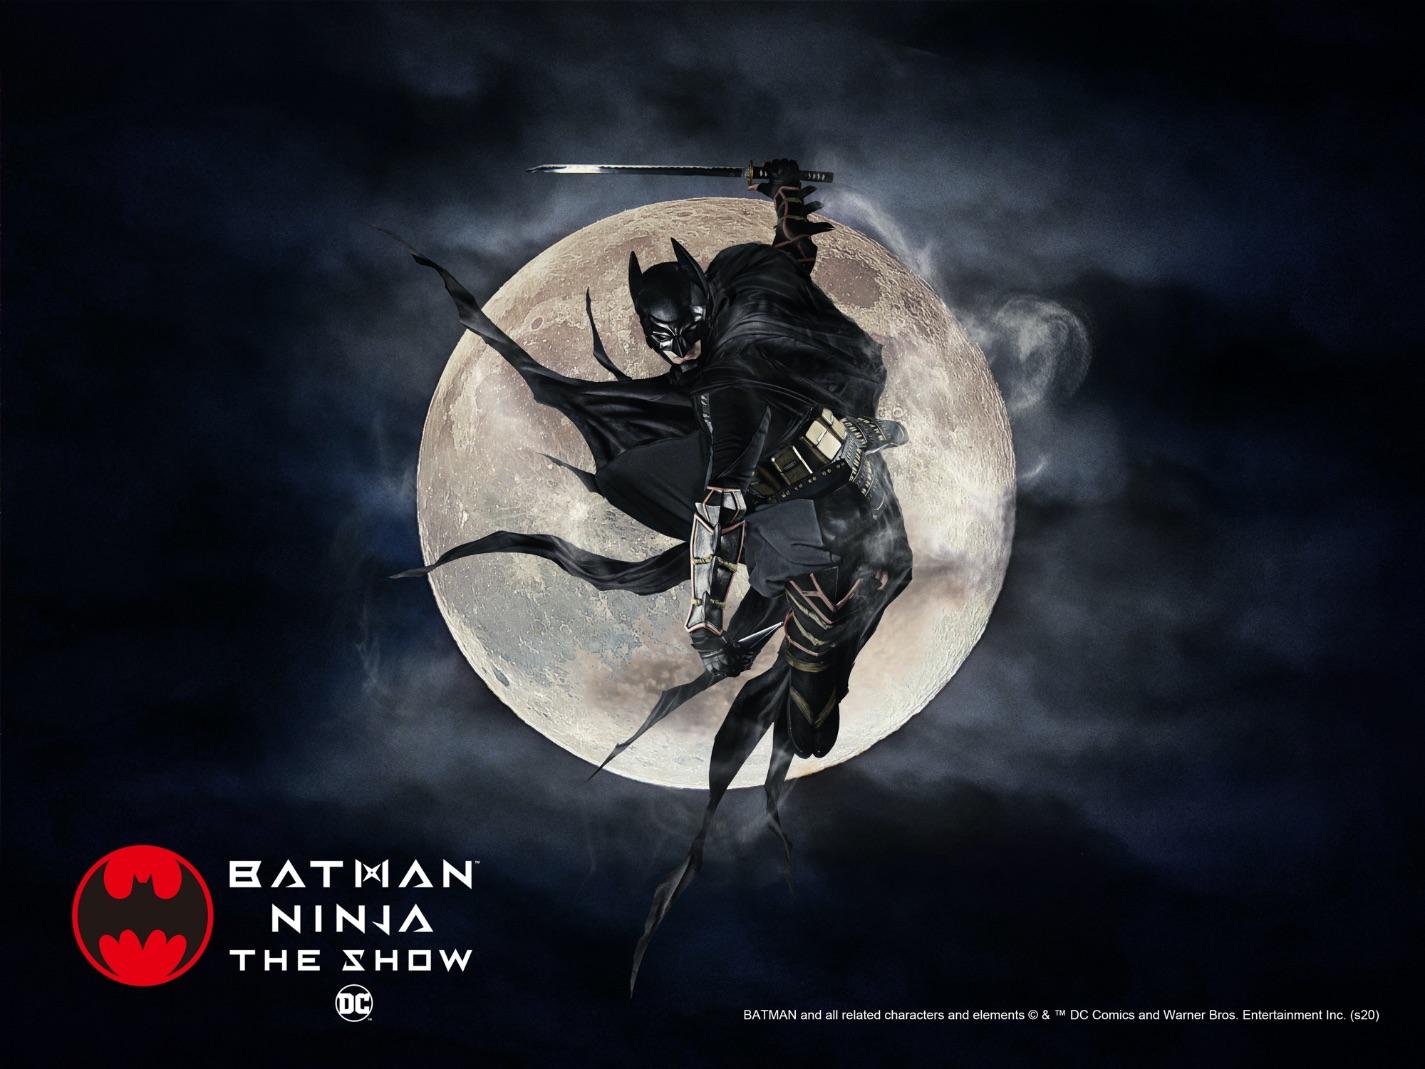 batman-ninja-the-show-%e3%83%8b%e3%83%b3%e3%82%b8%e3%83%a3%e3%83%90%e3%83%83%e3%83%88%e3%83%9e%e3%83%b3-%e3%82%b6%e3%83%bb%e3%82%b7%e3%83%a7%e3%83%bc%e5%bf%8d%e8%80%85-2